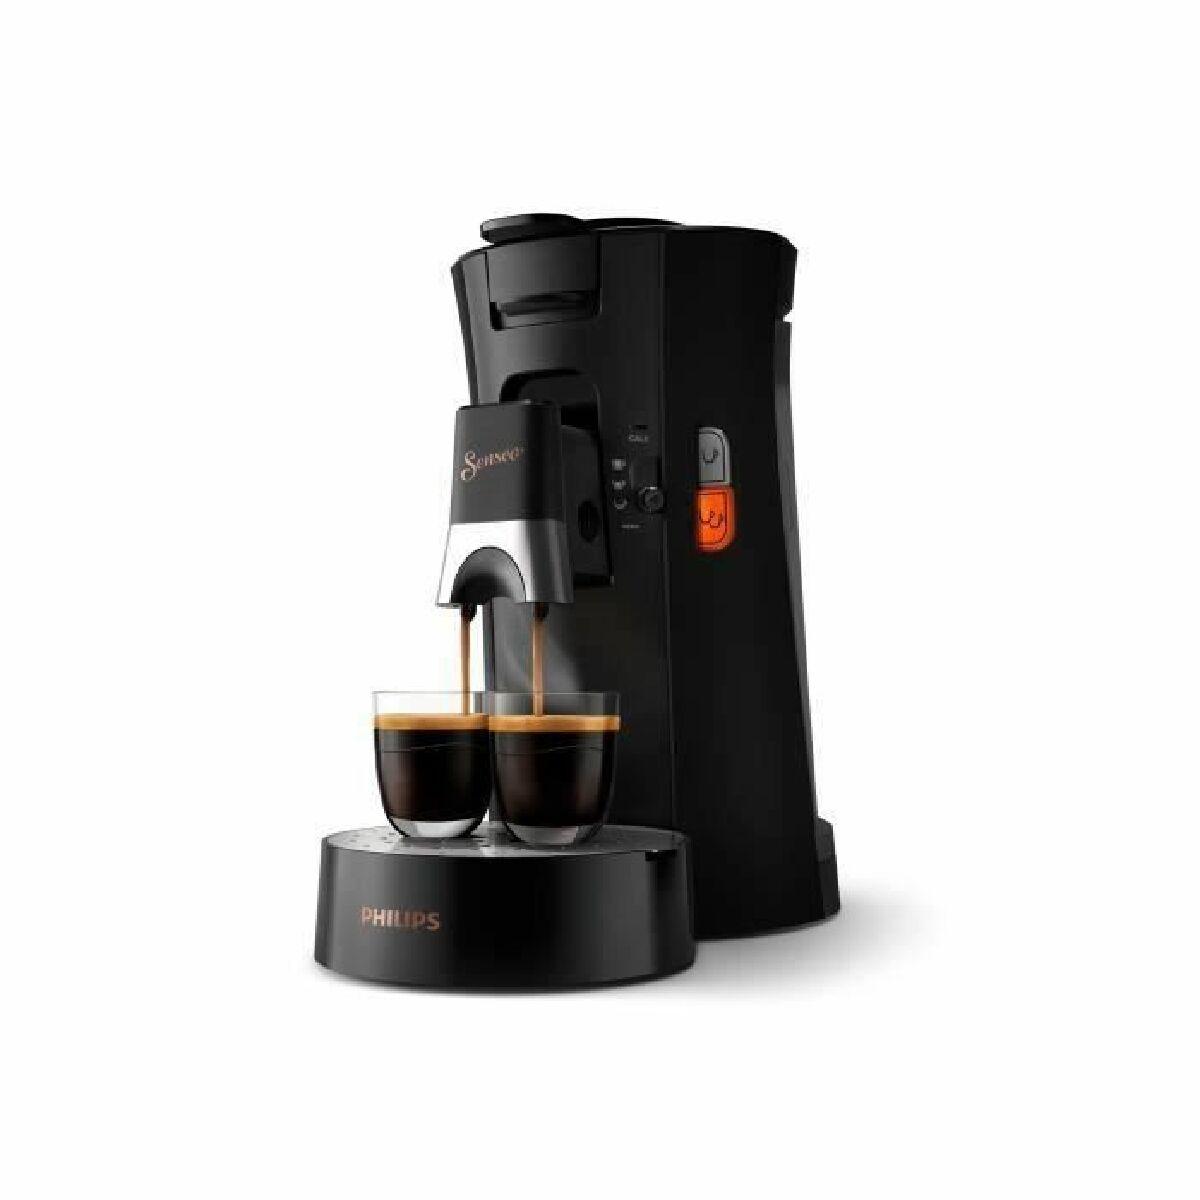 Philips PHILIPS Senseo Select CSA240/61 - Machine a café dosette - Noir